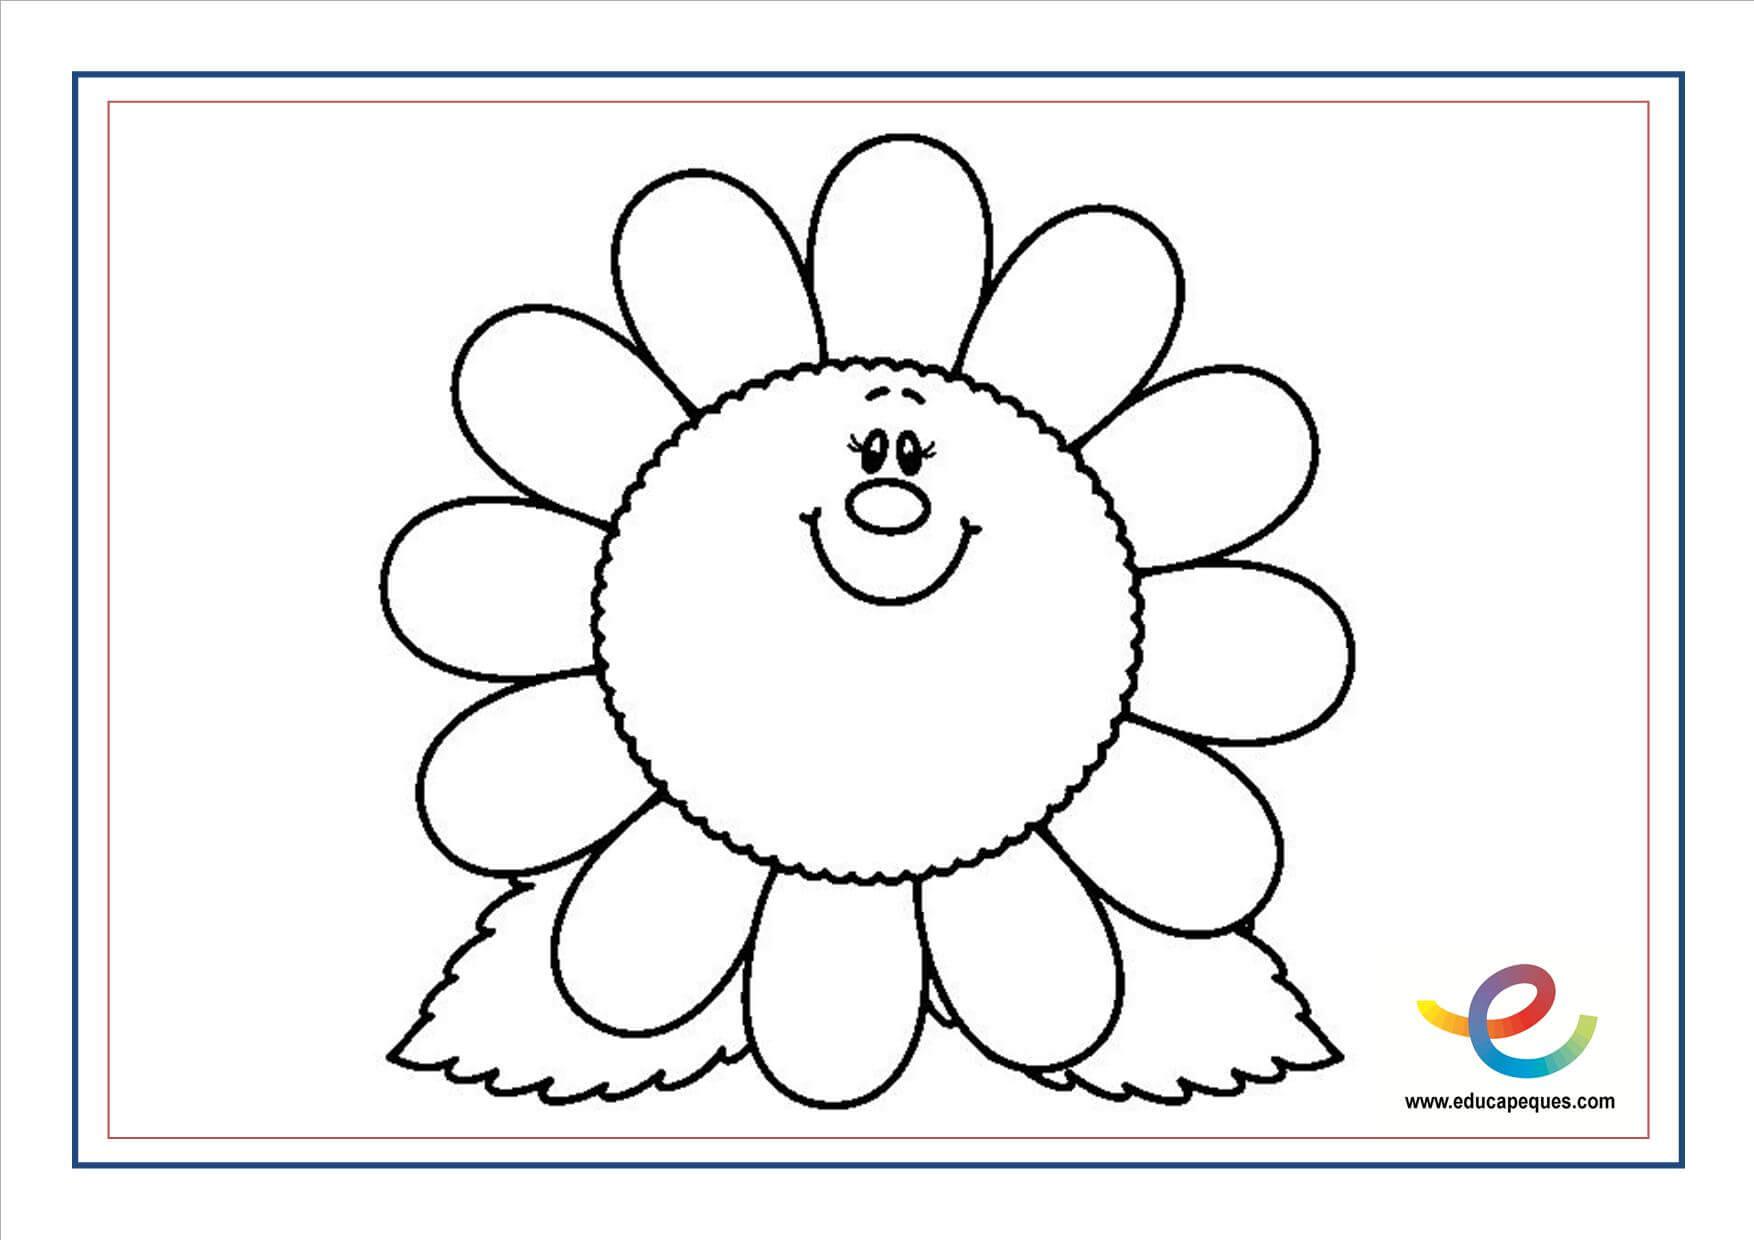 Flores Para Colorear. Simple Flor Primaveral Dibujalia Dibujos Para ...